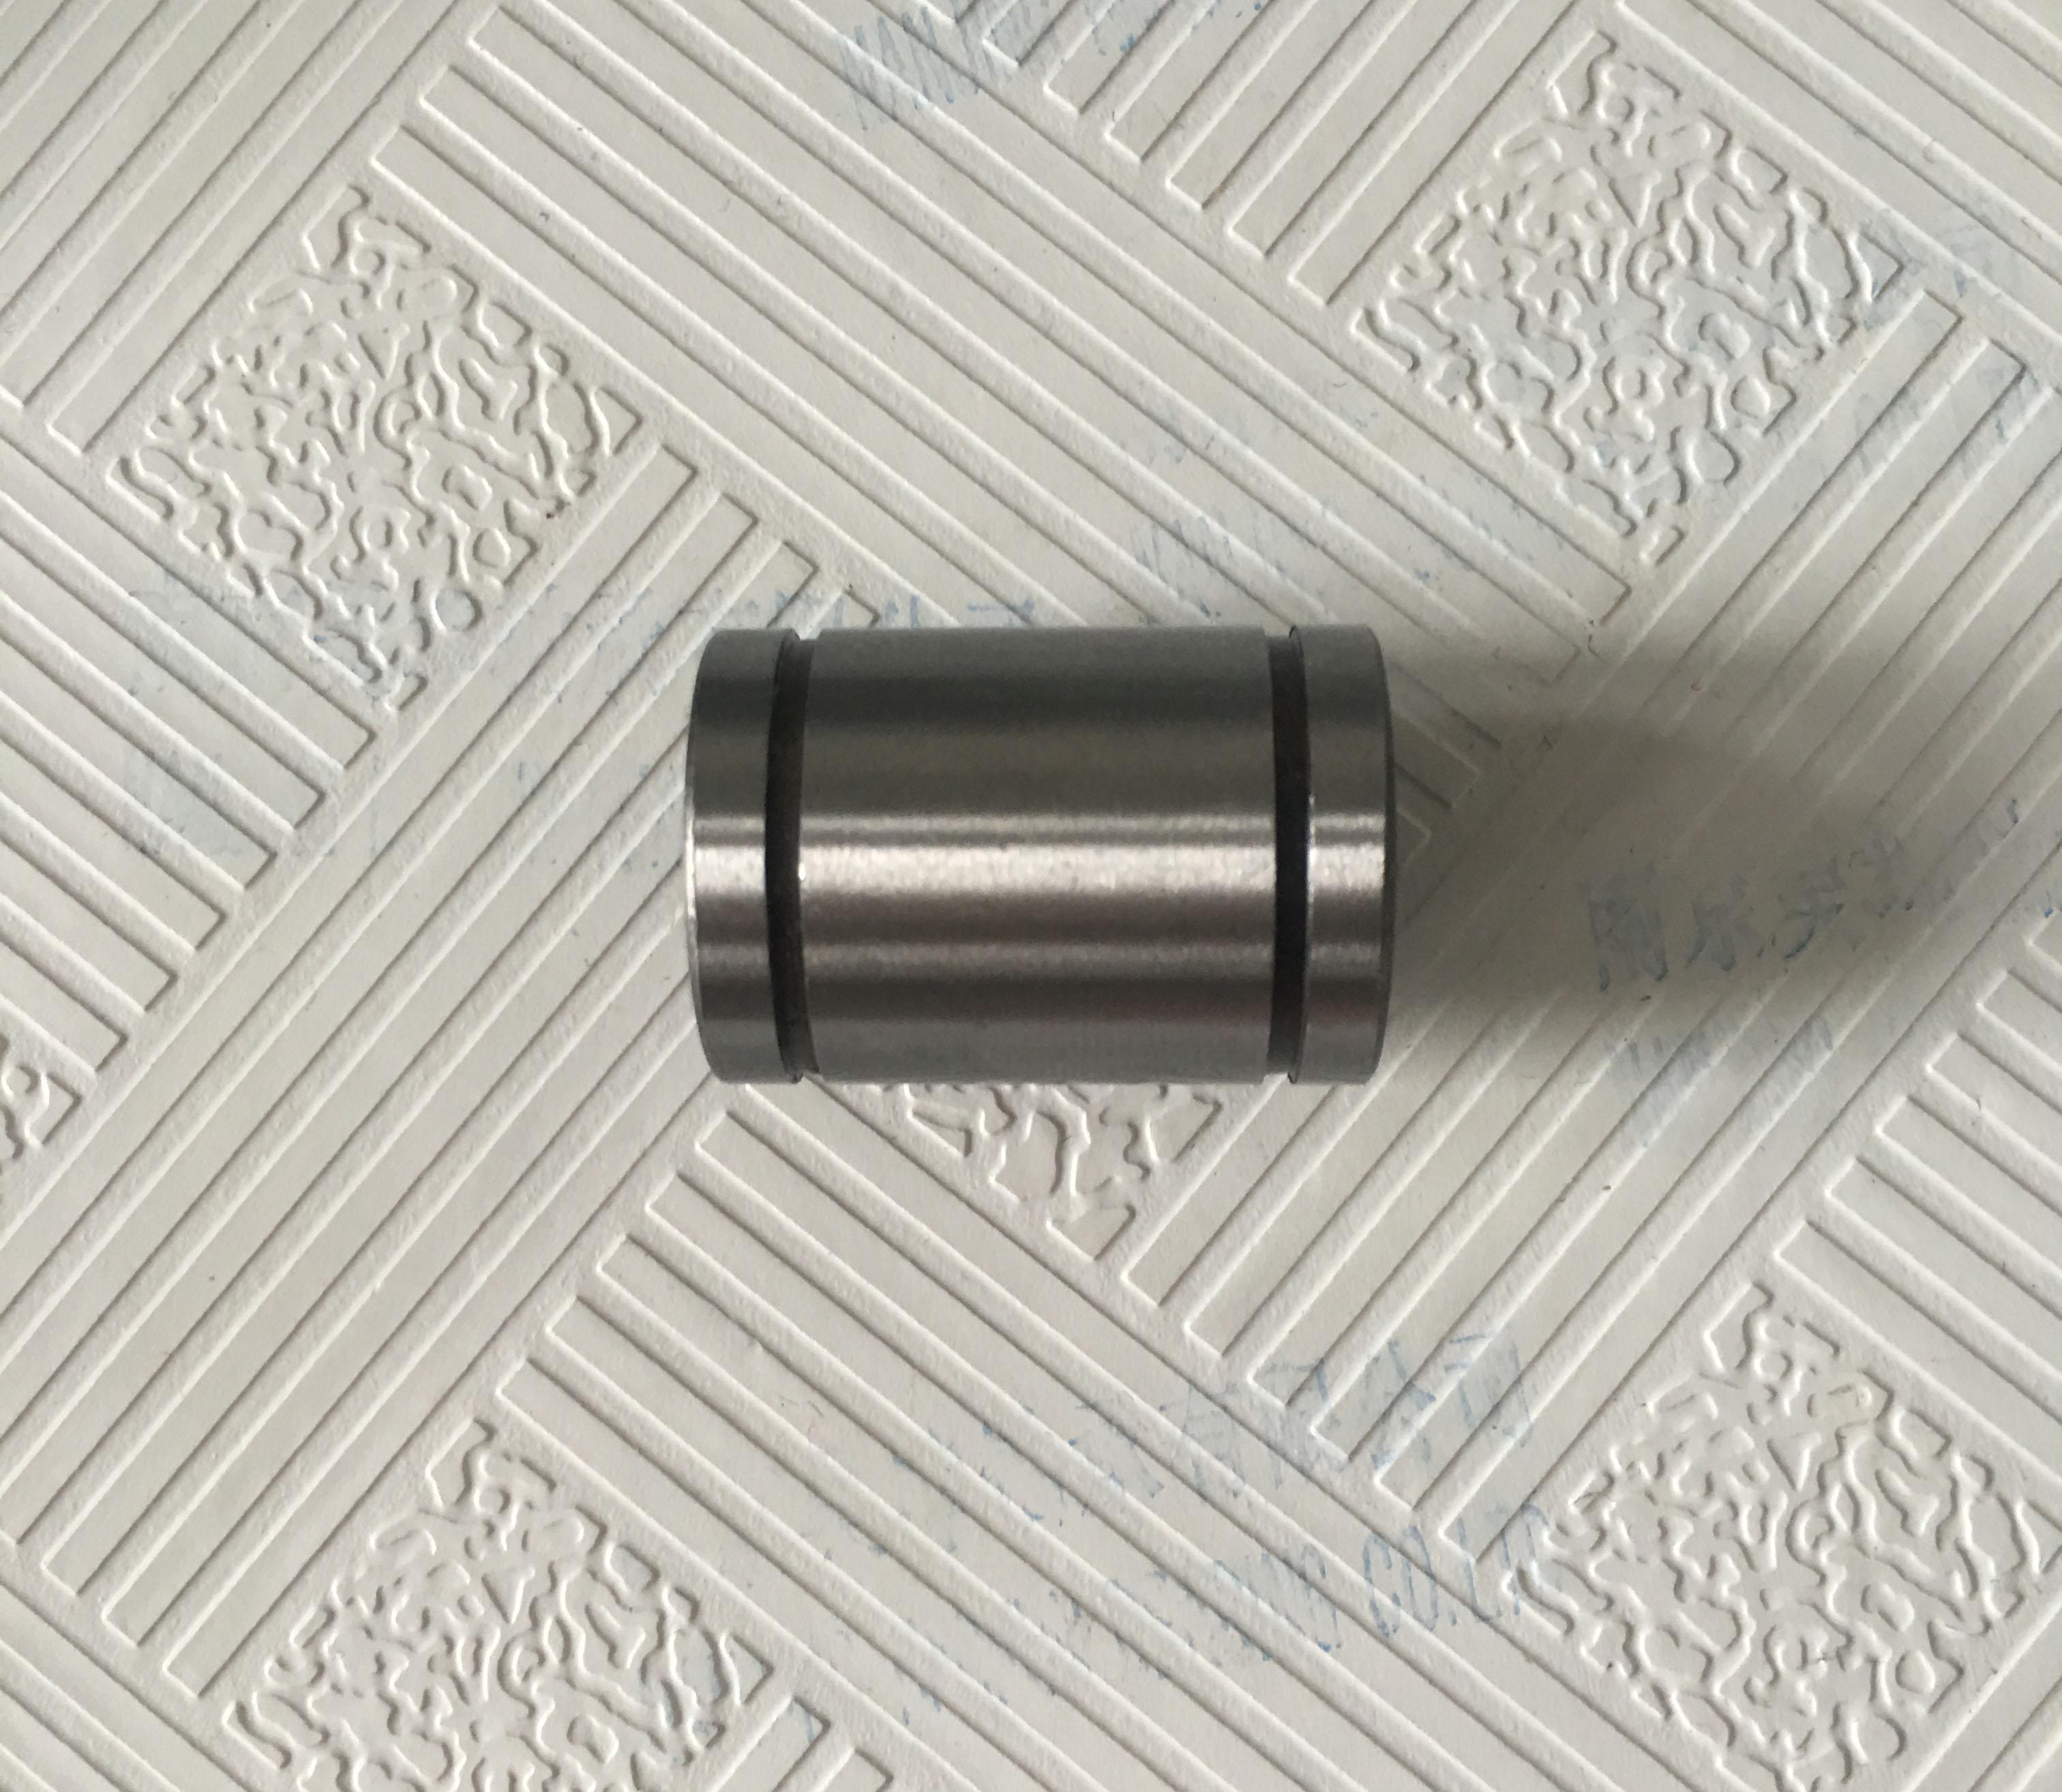 Free shipping!!12 pcs-lot LM8UU 8mm linear ball bearing Linear Bearing 8mm 3d printer parts LM8